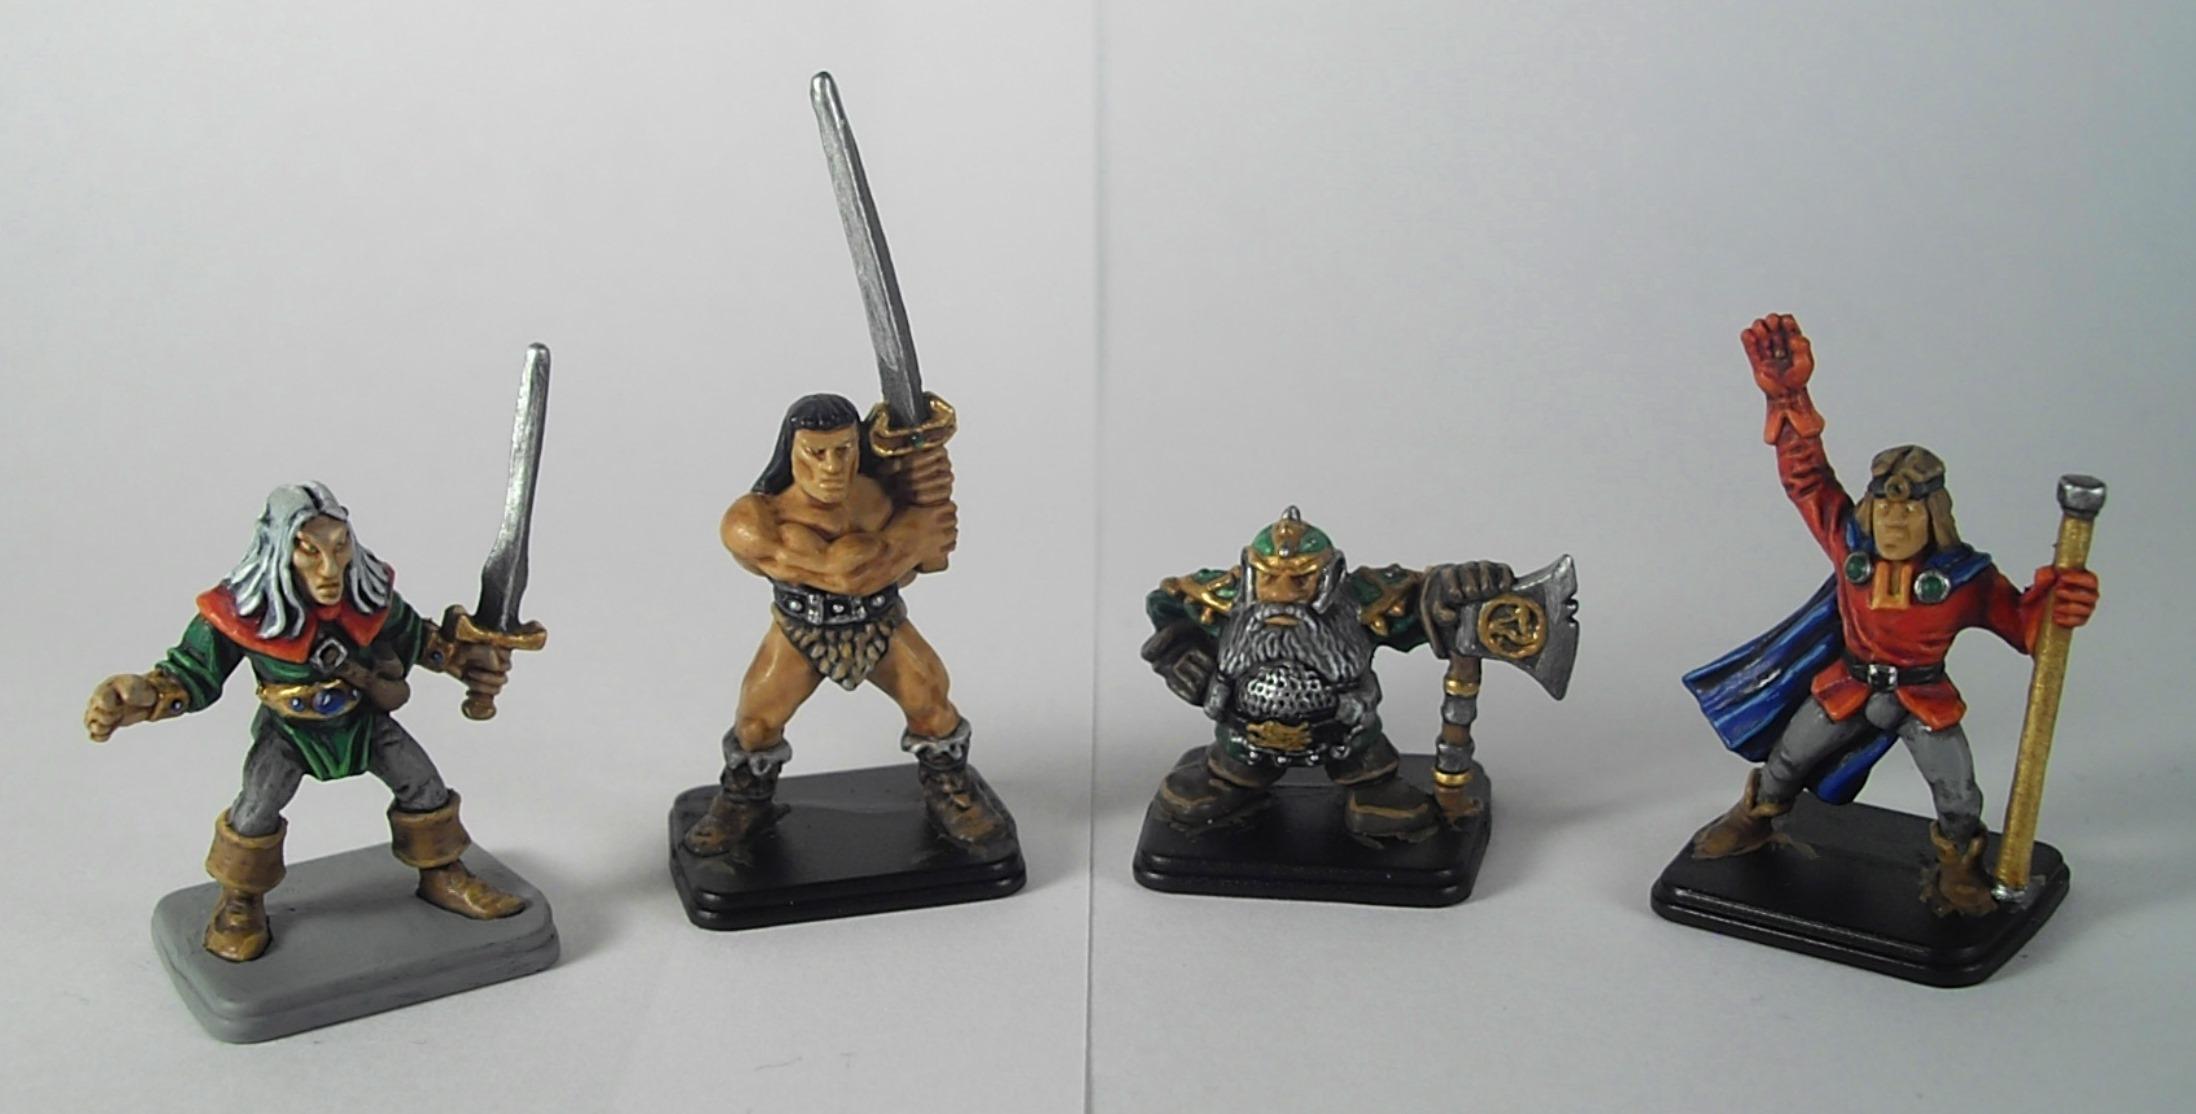 Barbarian, Dwarves, Elves, Hero Quest, Wizard